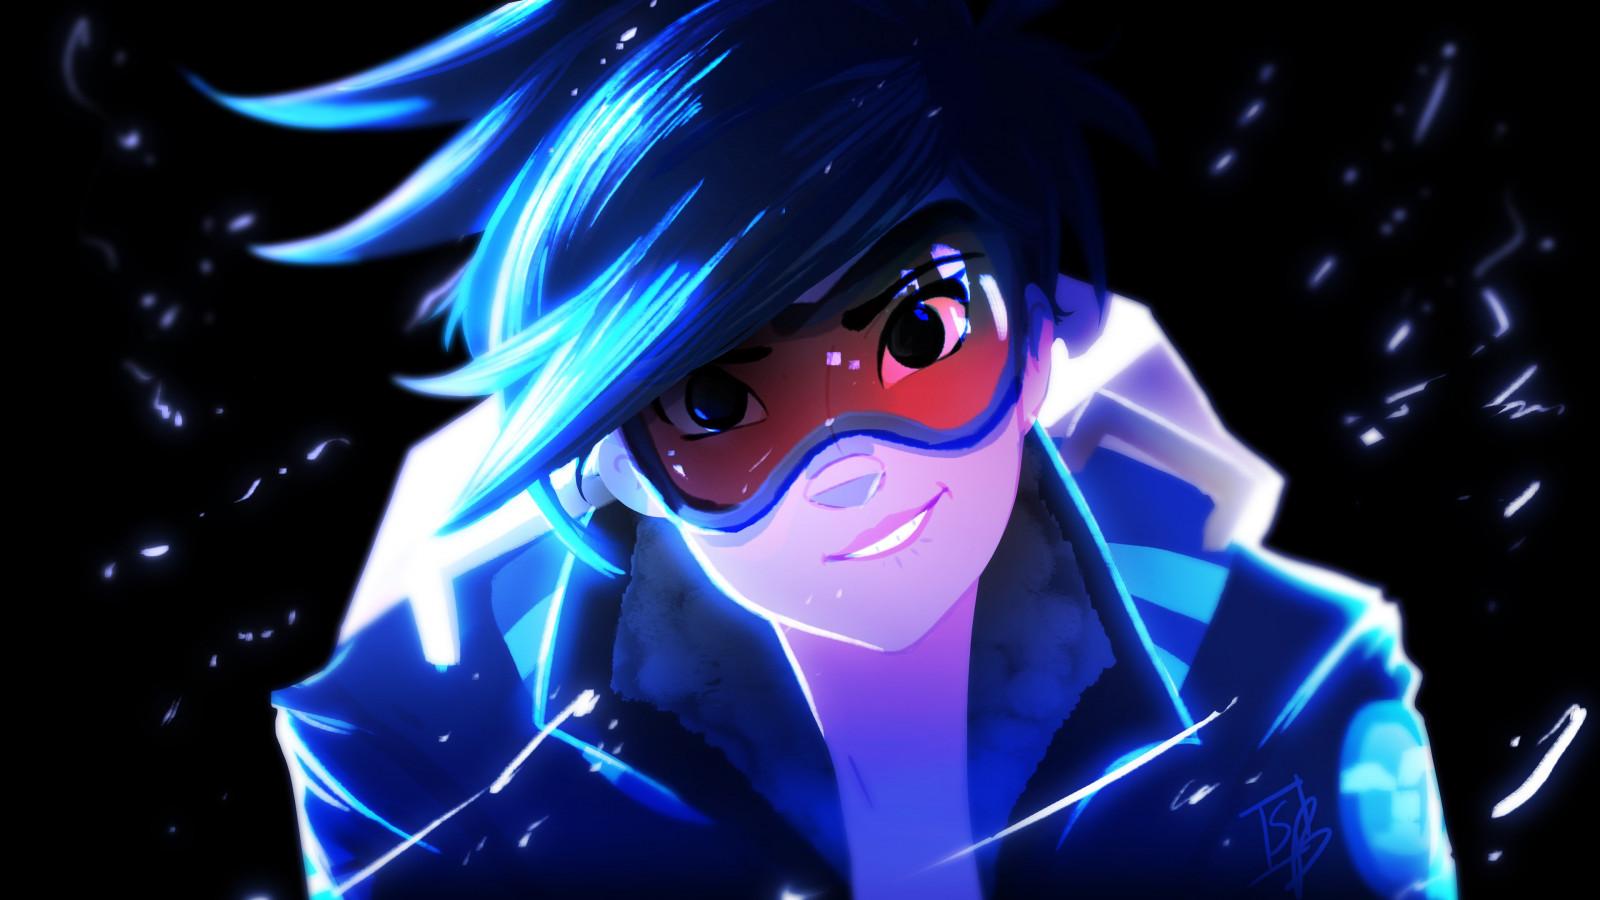 Wallpaper : anime, blue, Tracer Overwatch, Blizzard ...